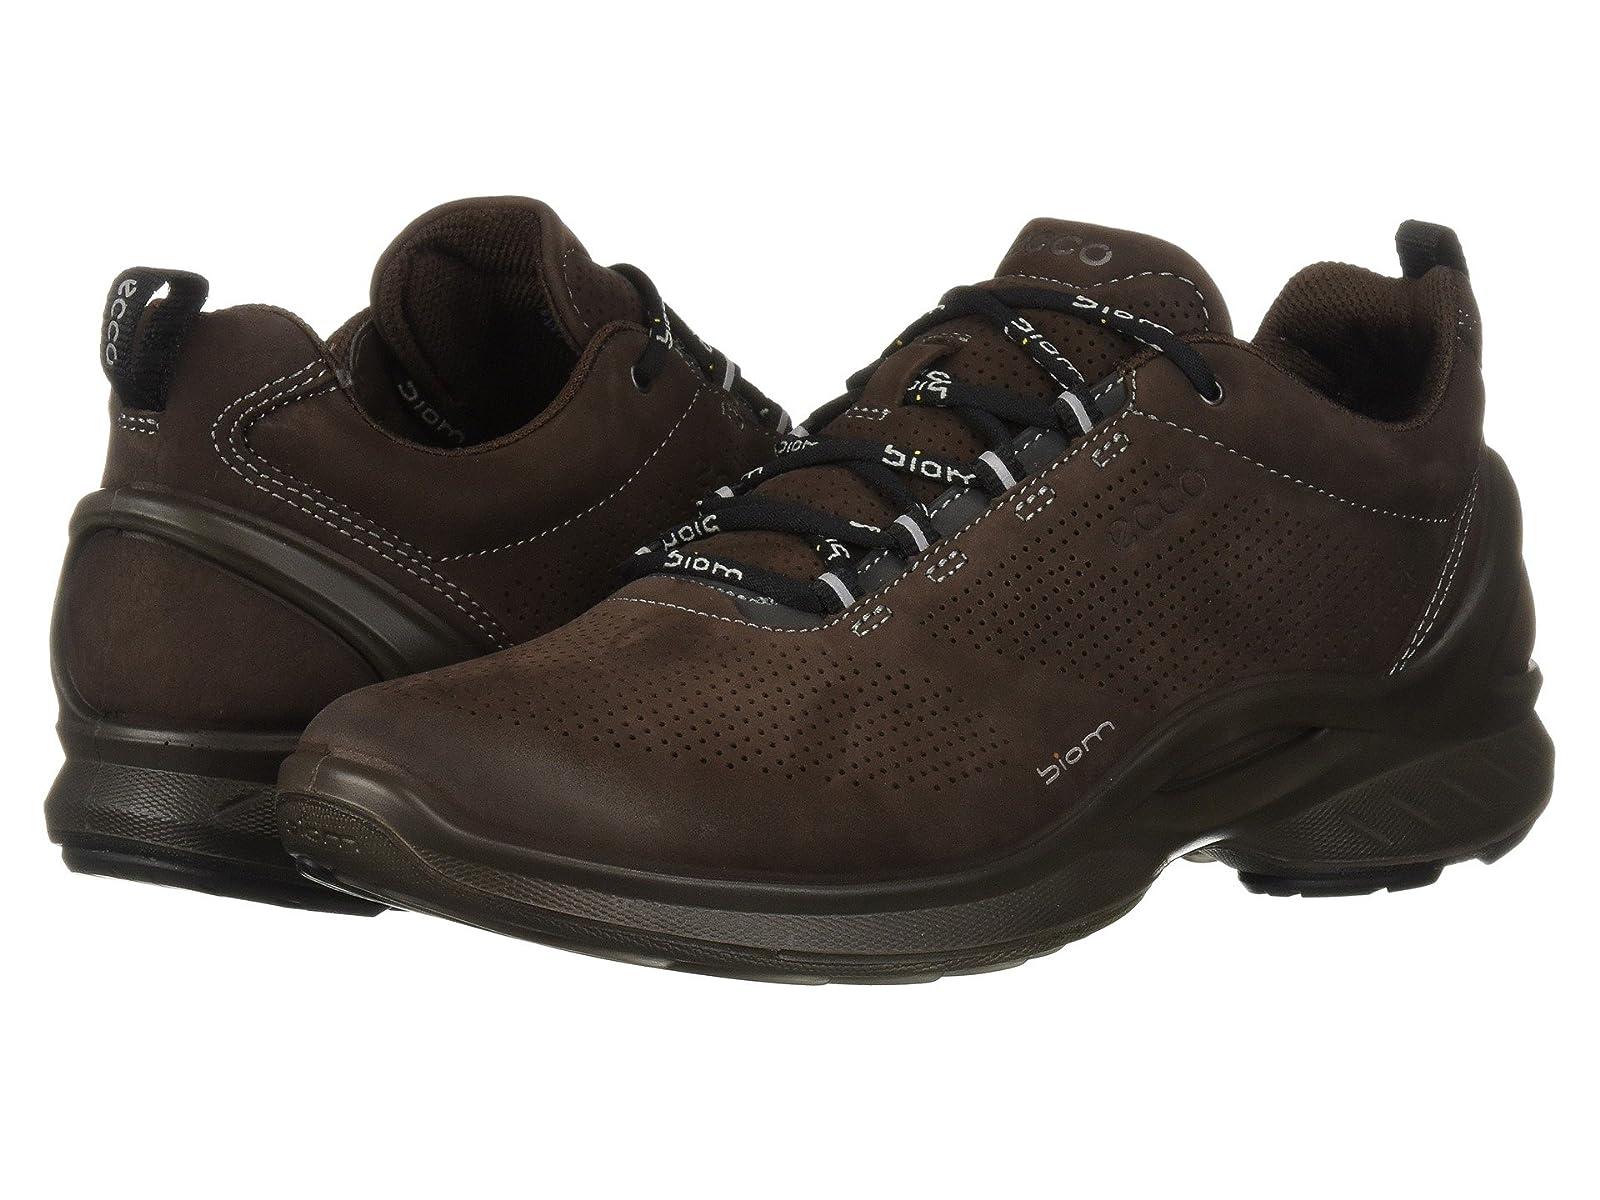 ECCO Biom FjuelAtmospheric grades have affordable shoes